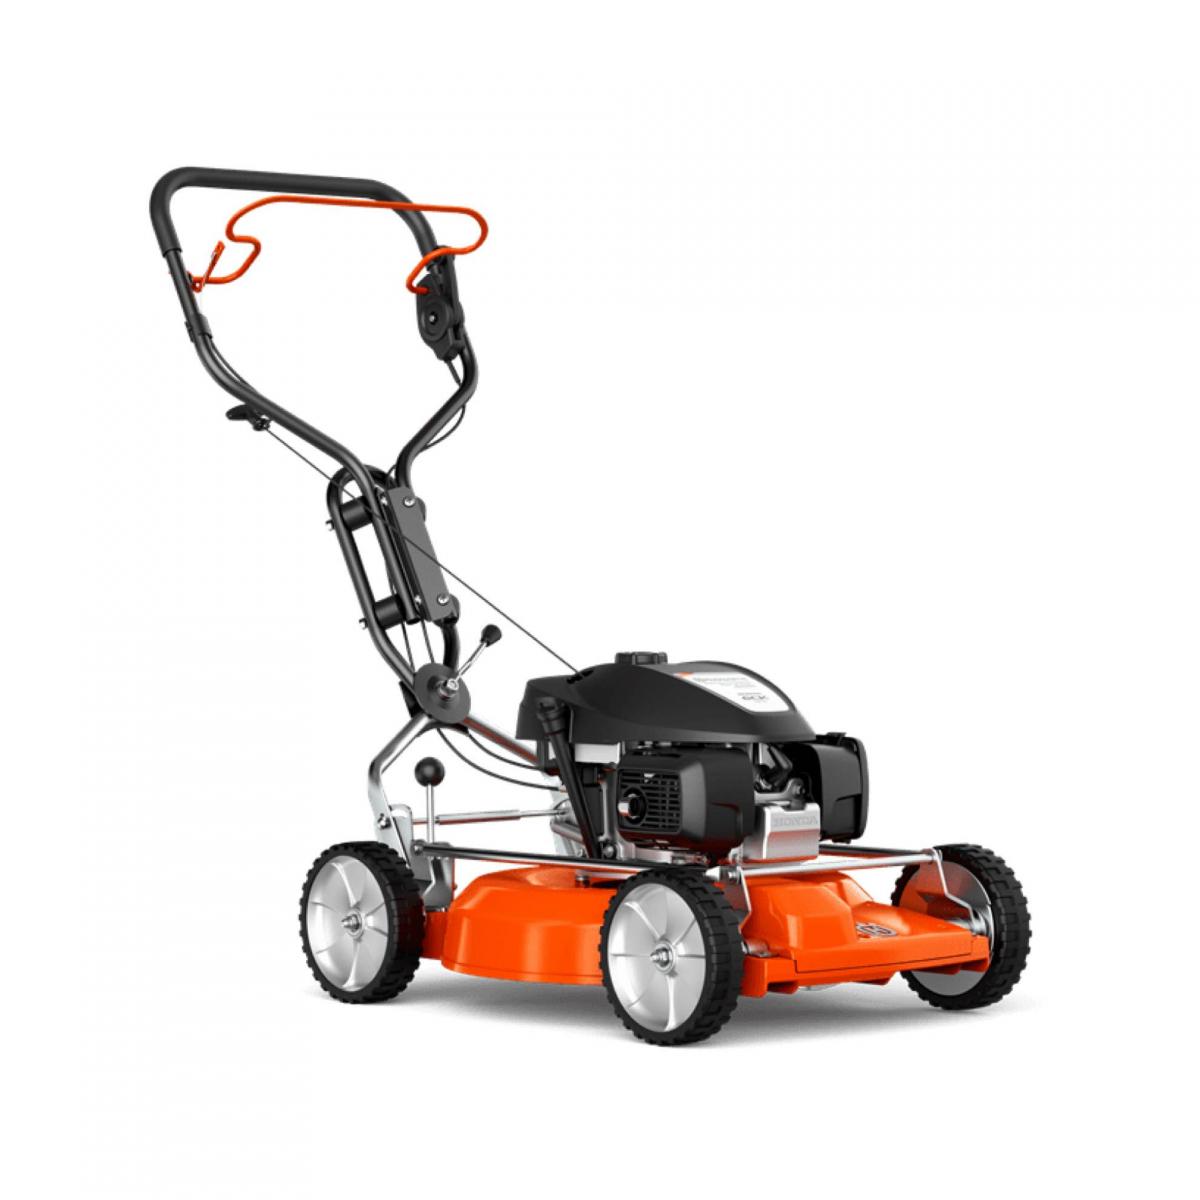 Husqvarna KLIPPO LB 553S e Petrol-powered Lawn Mower